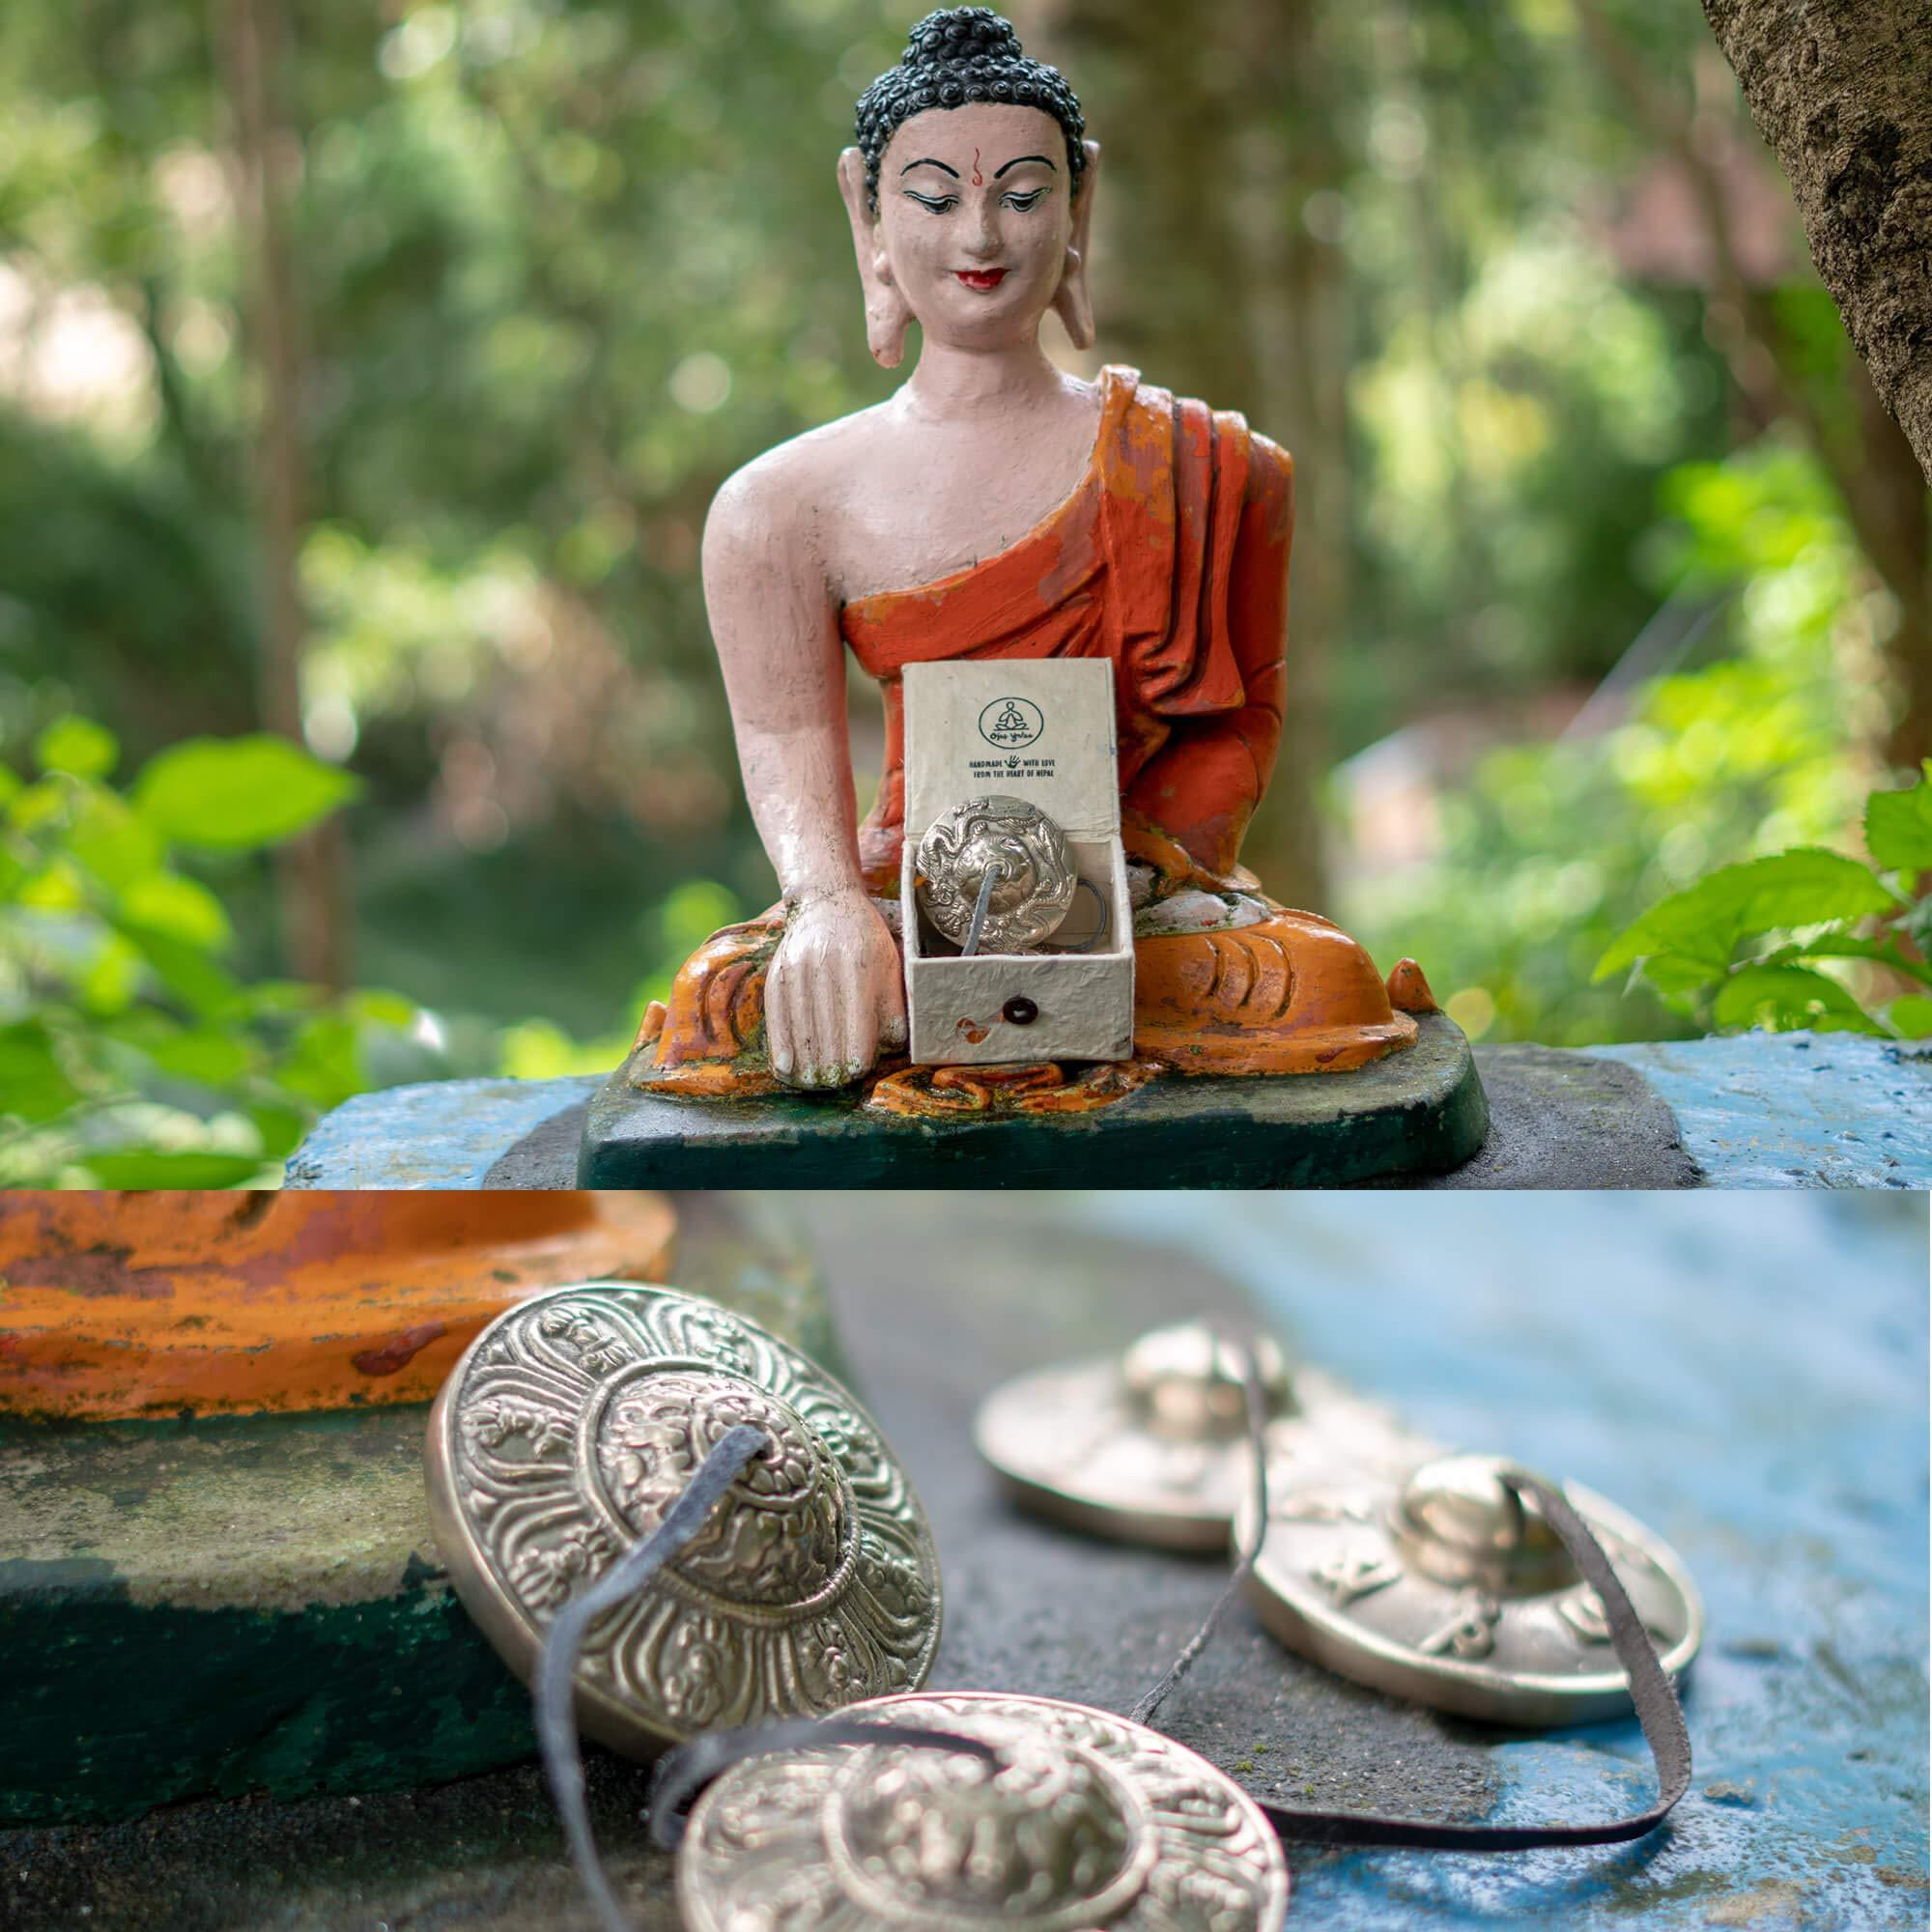 Handmade Tibetan Tingsha Cymbals - OM Mani Padme Hum - Premium Buddhist Meditation Bell - Yoga/Spiritual/Buddhist/Chimes/Hand percussion instrument/Home Decor Gift Set